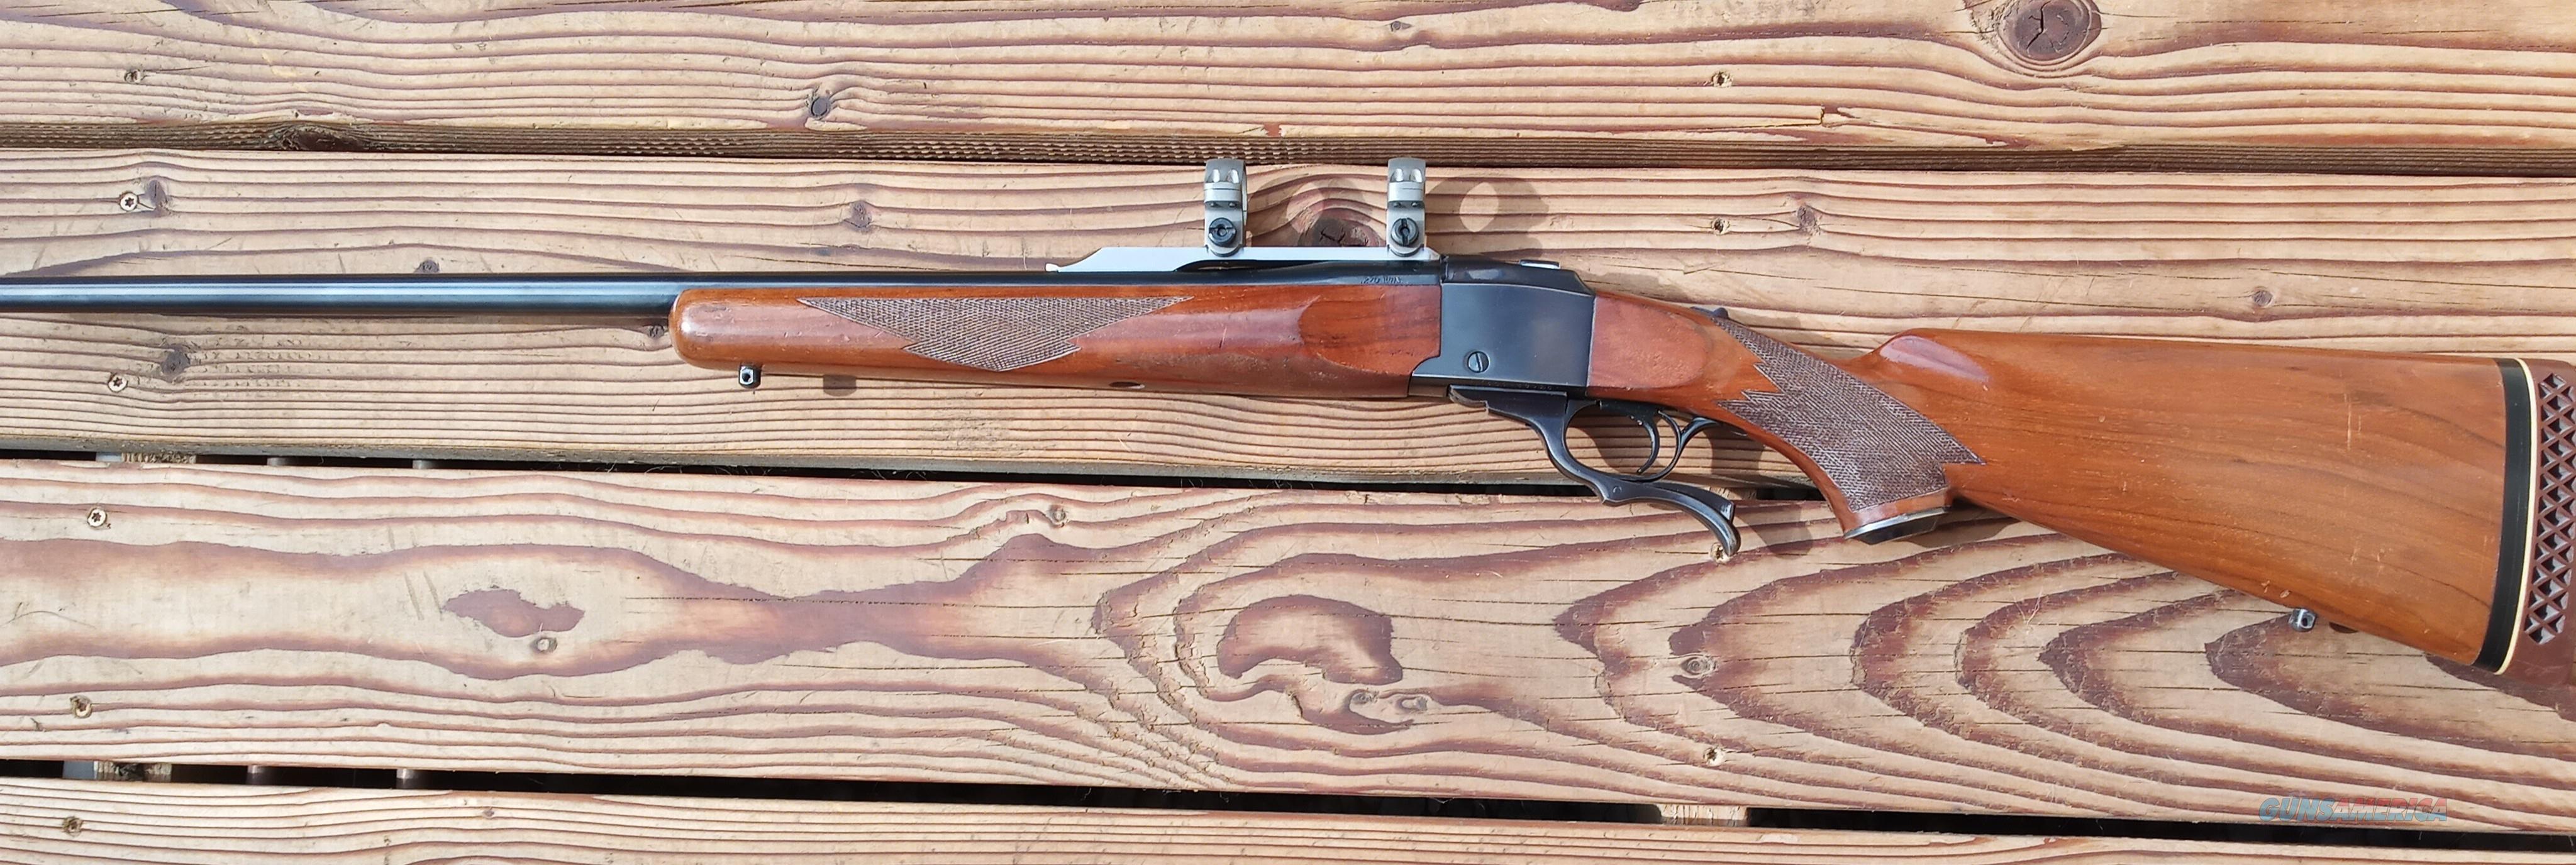 Ruger No.1 caliber 270 WIN  Guns > Rifles > Ruger Rifles > #1 Type